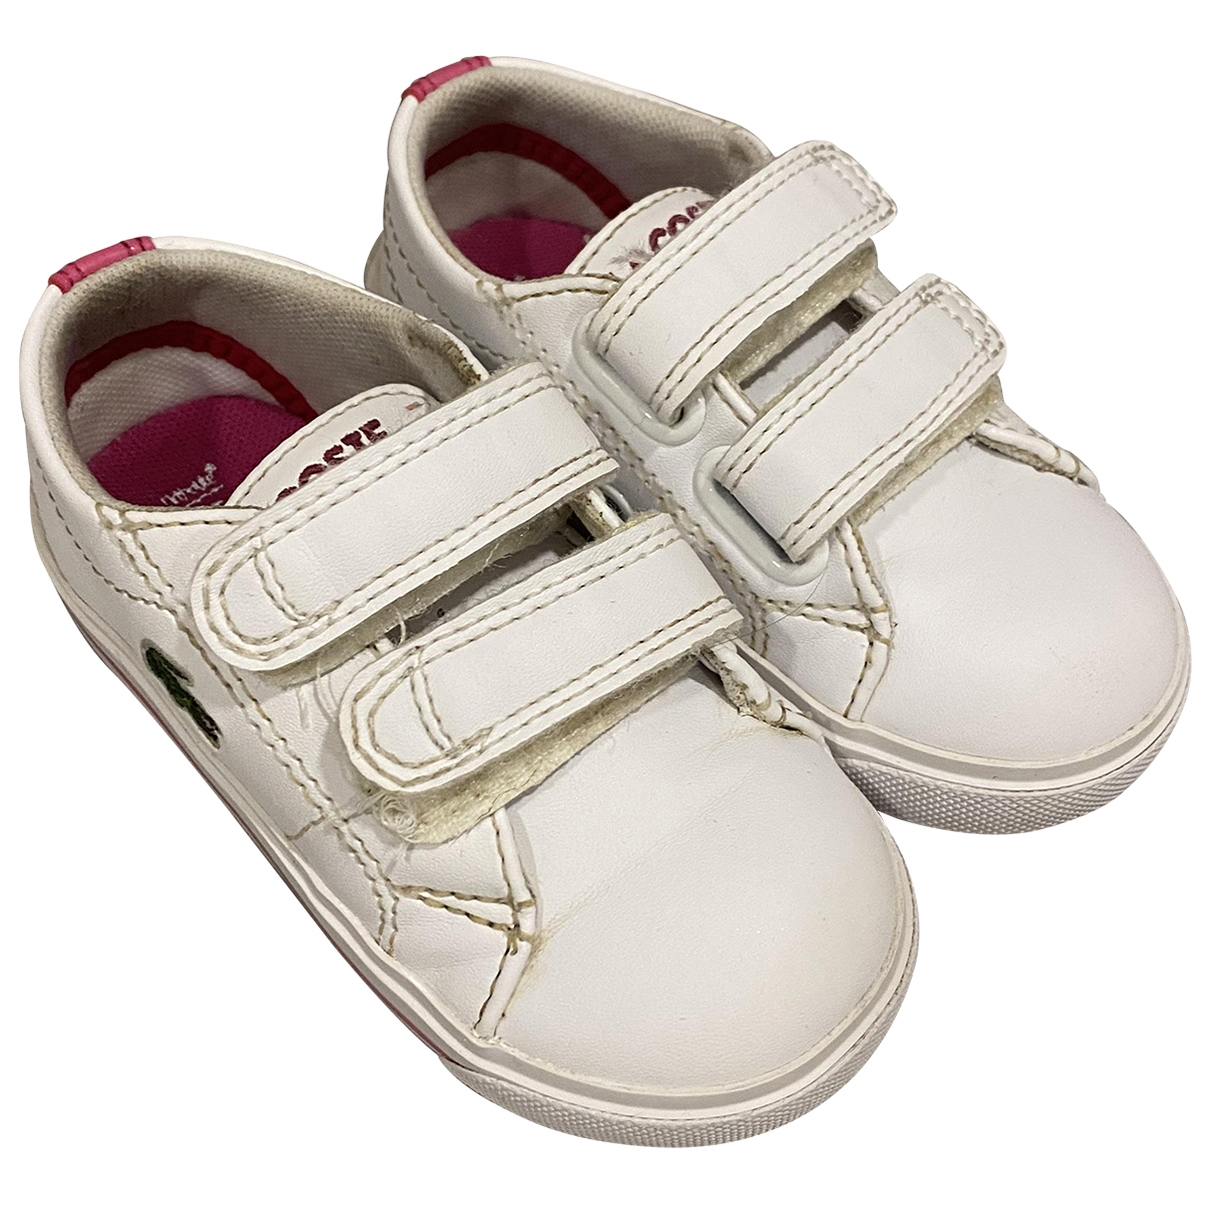 Lacoste \N Sneakers in  Weiss Leder